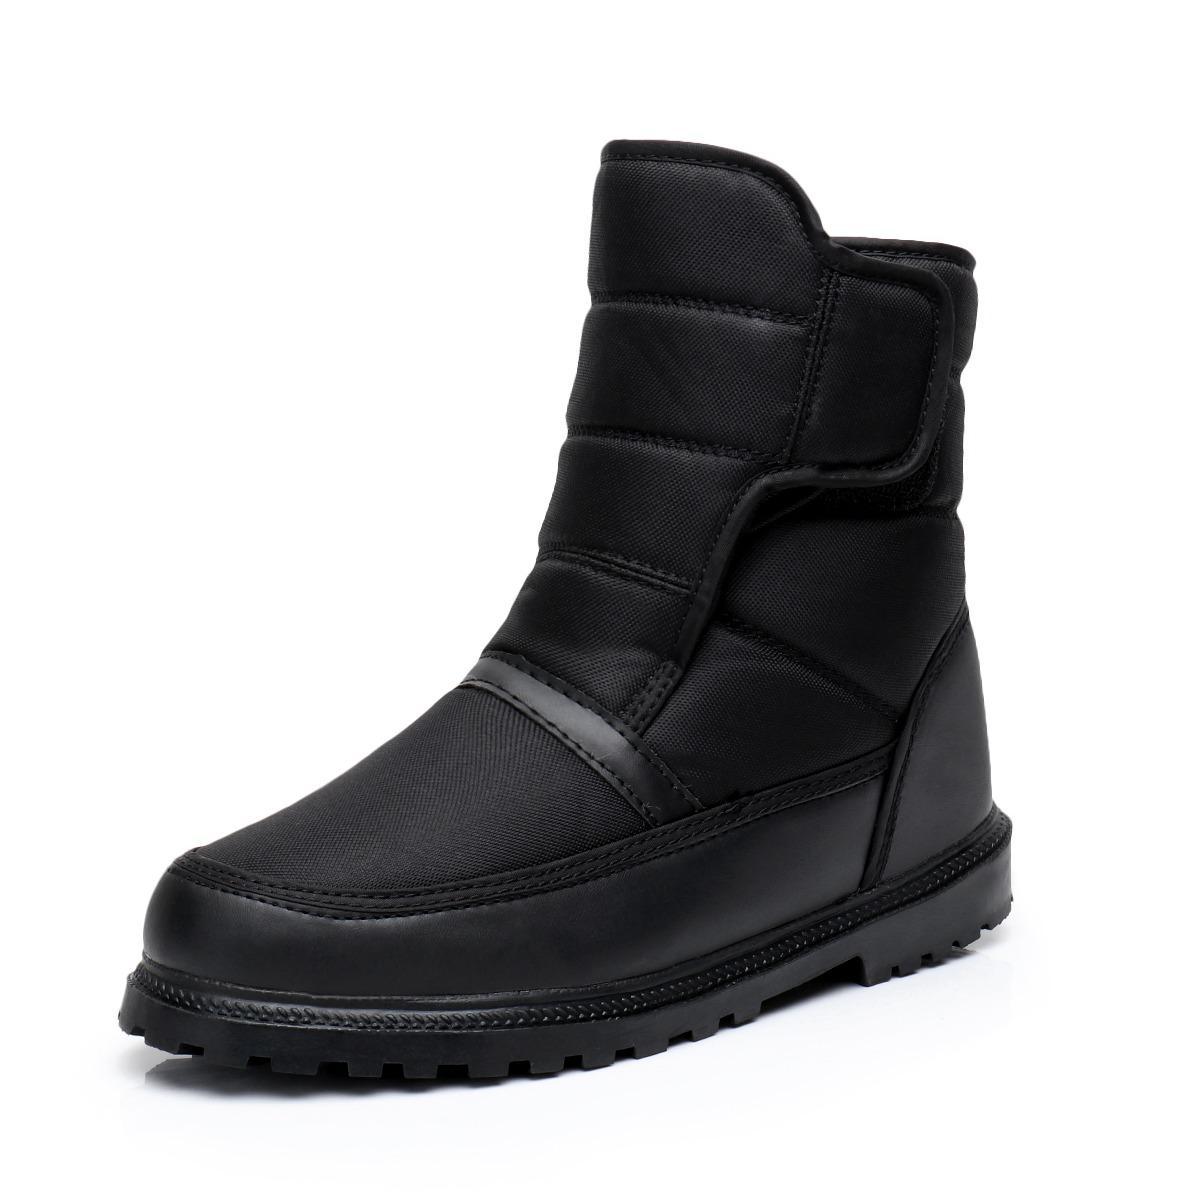 36e13740d0b3 Winter Warm plus Velvet Anti-slip Button Men Snow Boots Waterproof  Anti-slip Snow